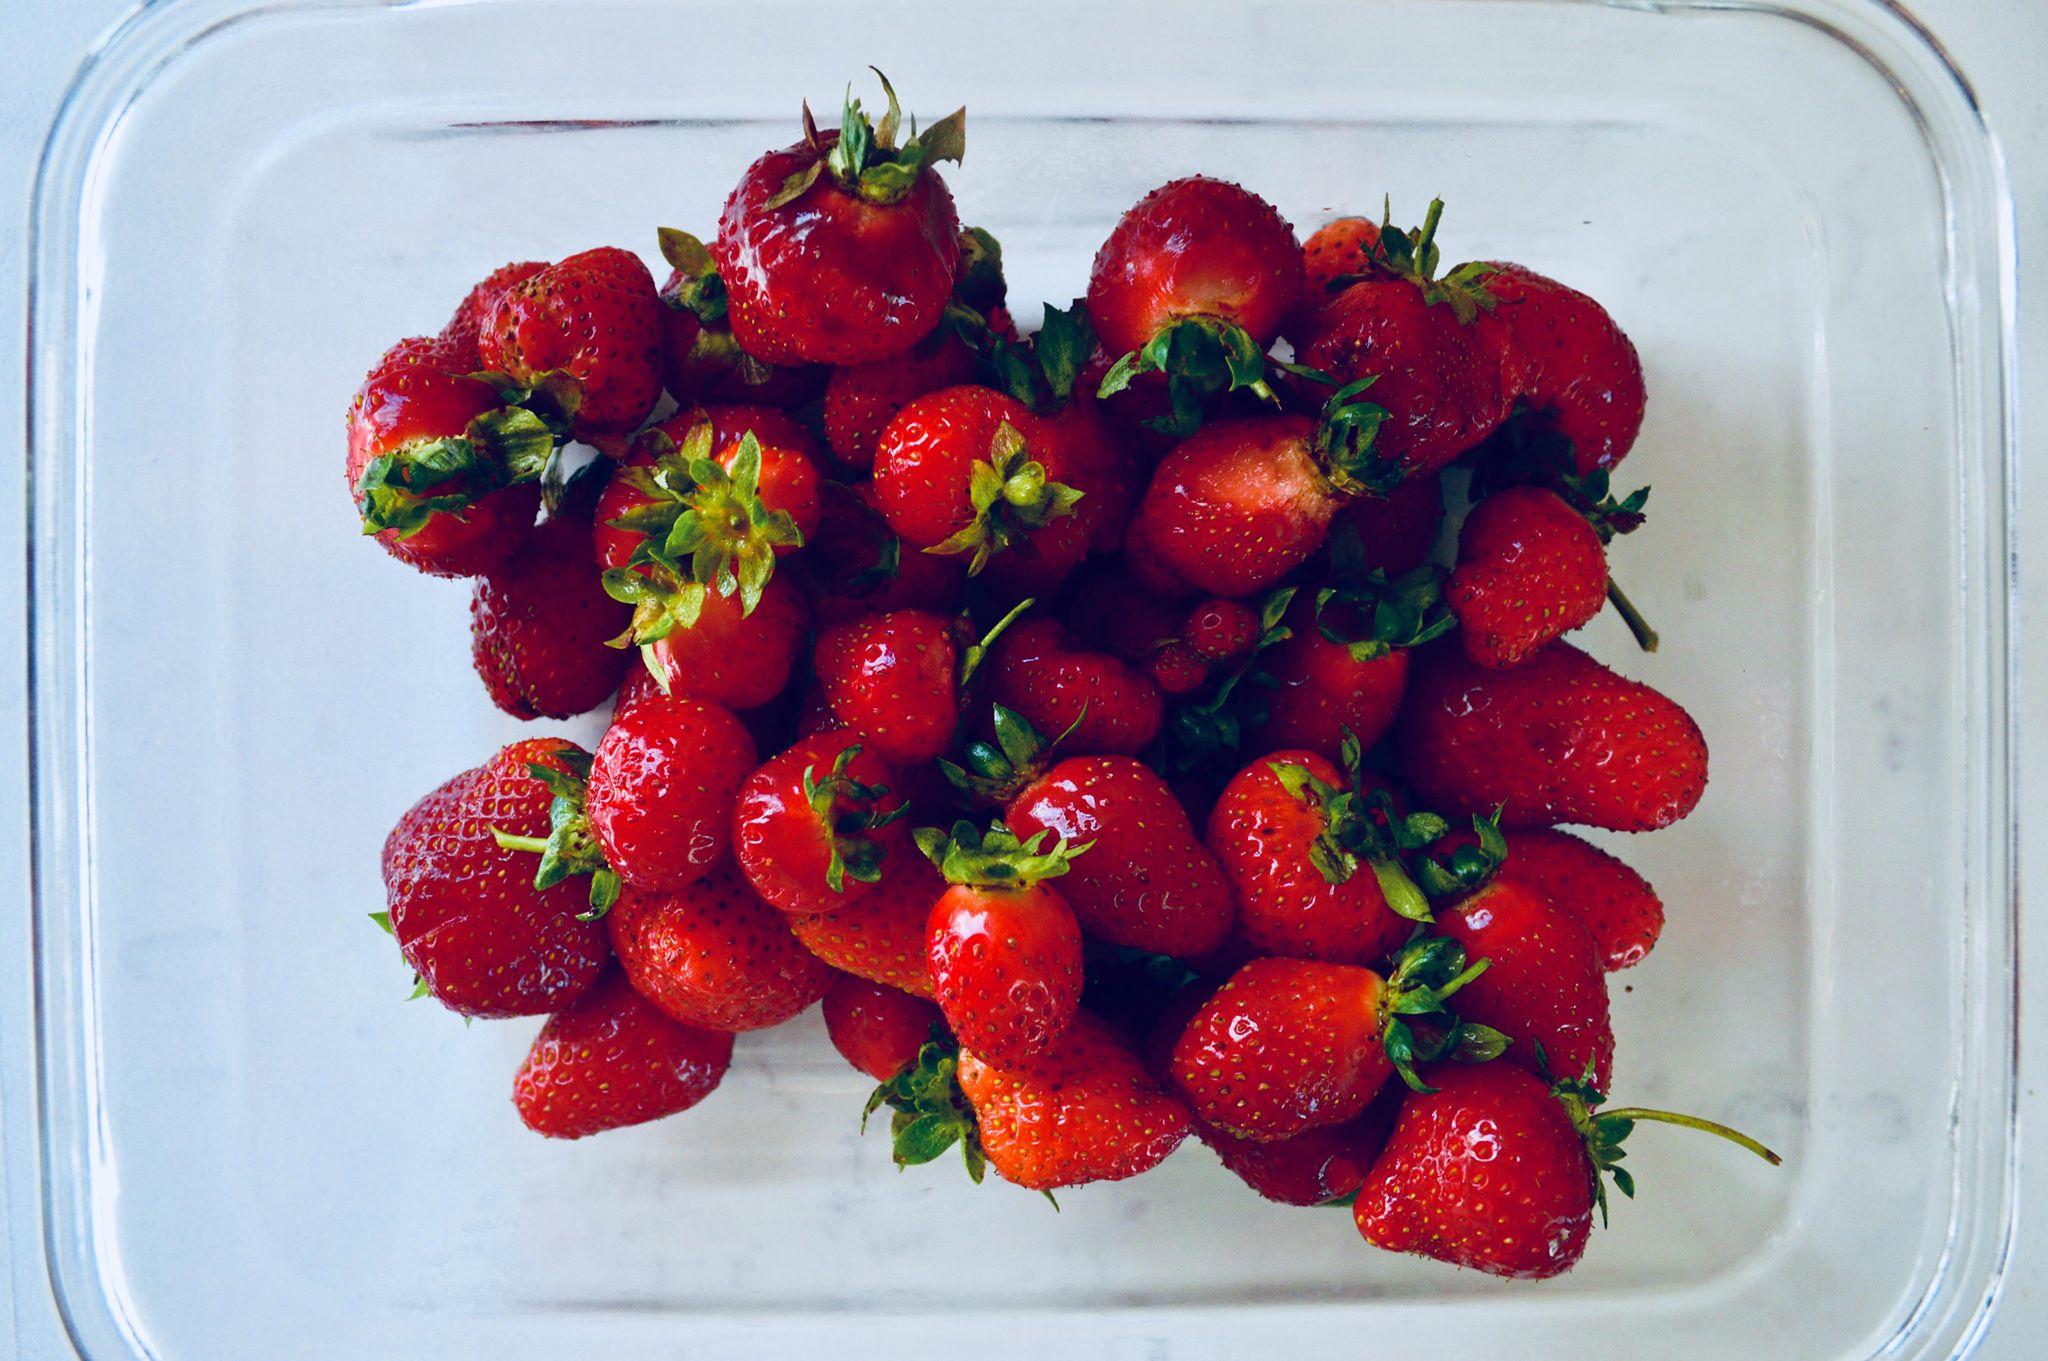 backyard gardening, modern homestead, homegrown, fresh strawberries